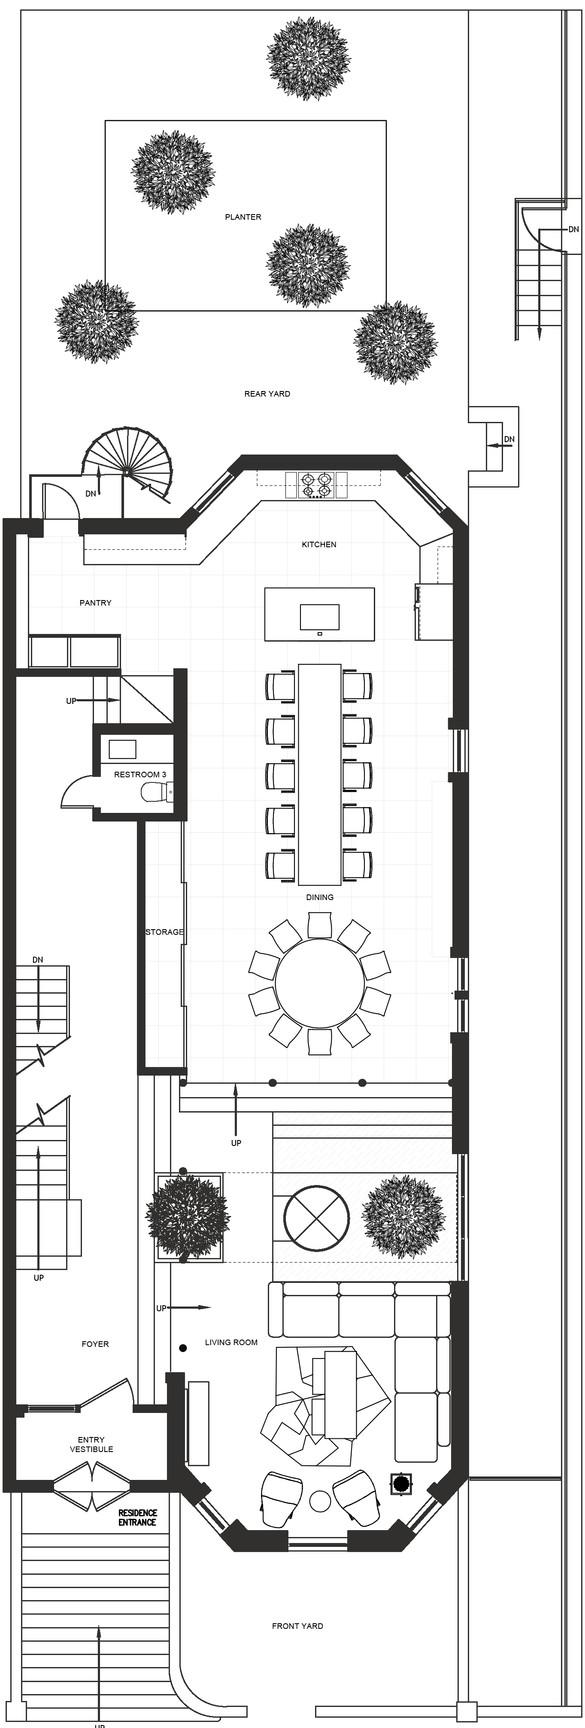 2nd floor main.jpg